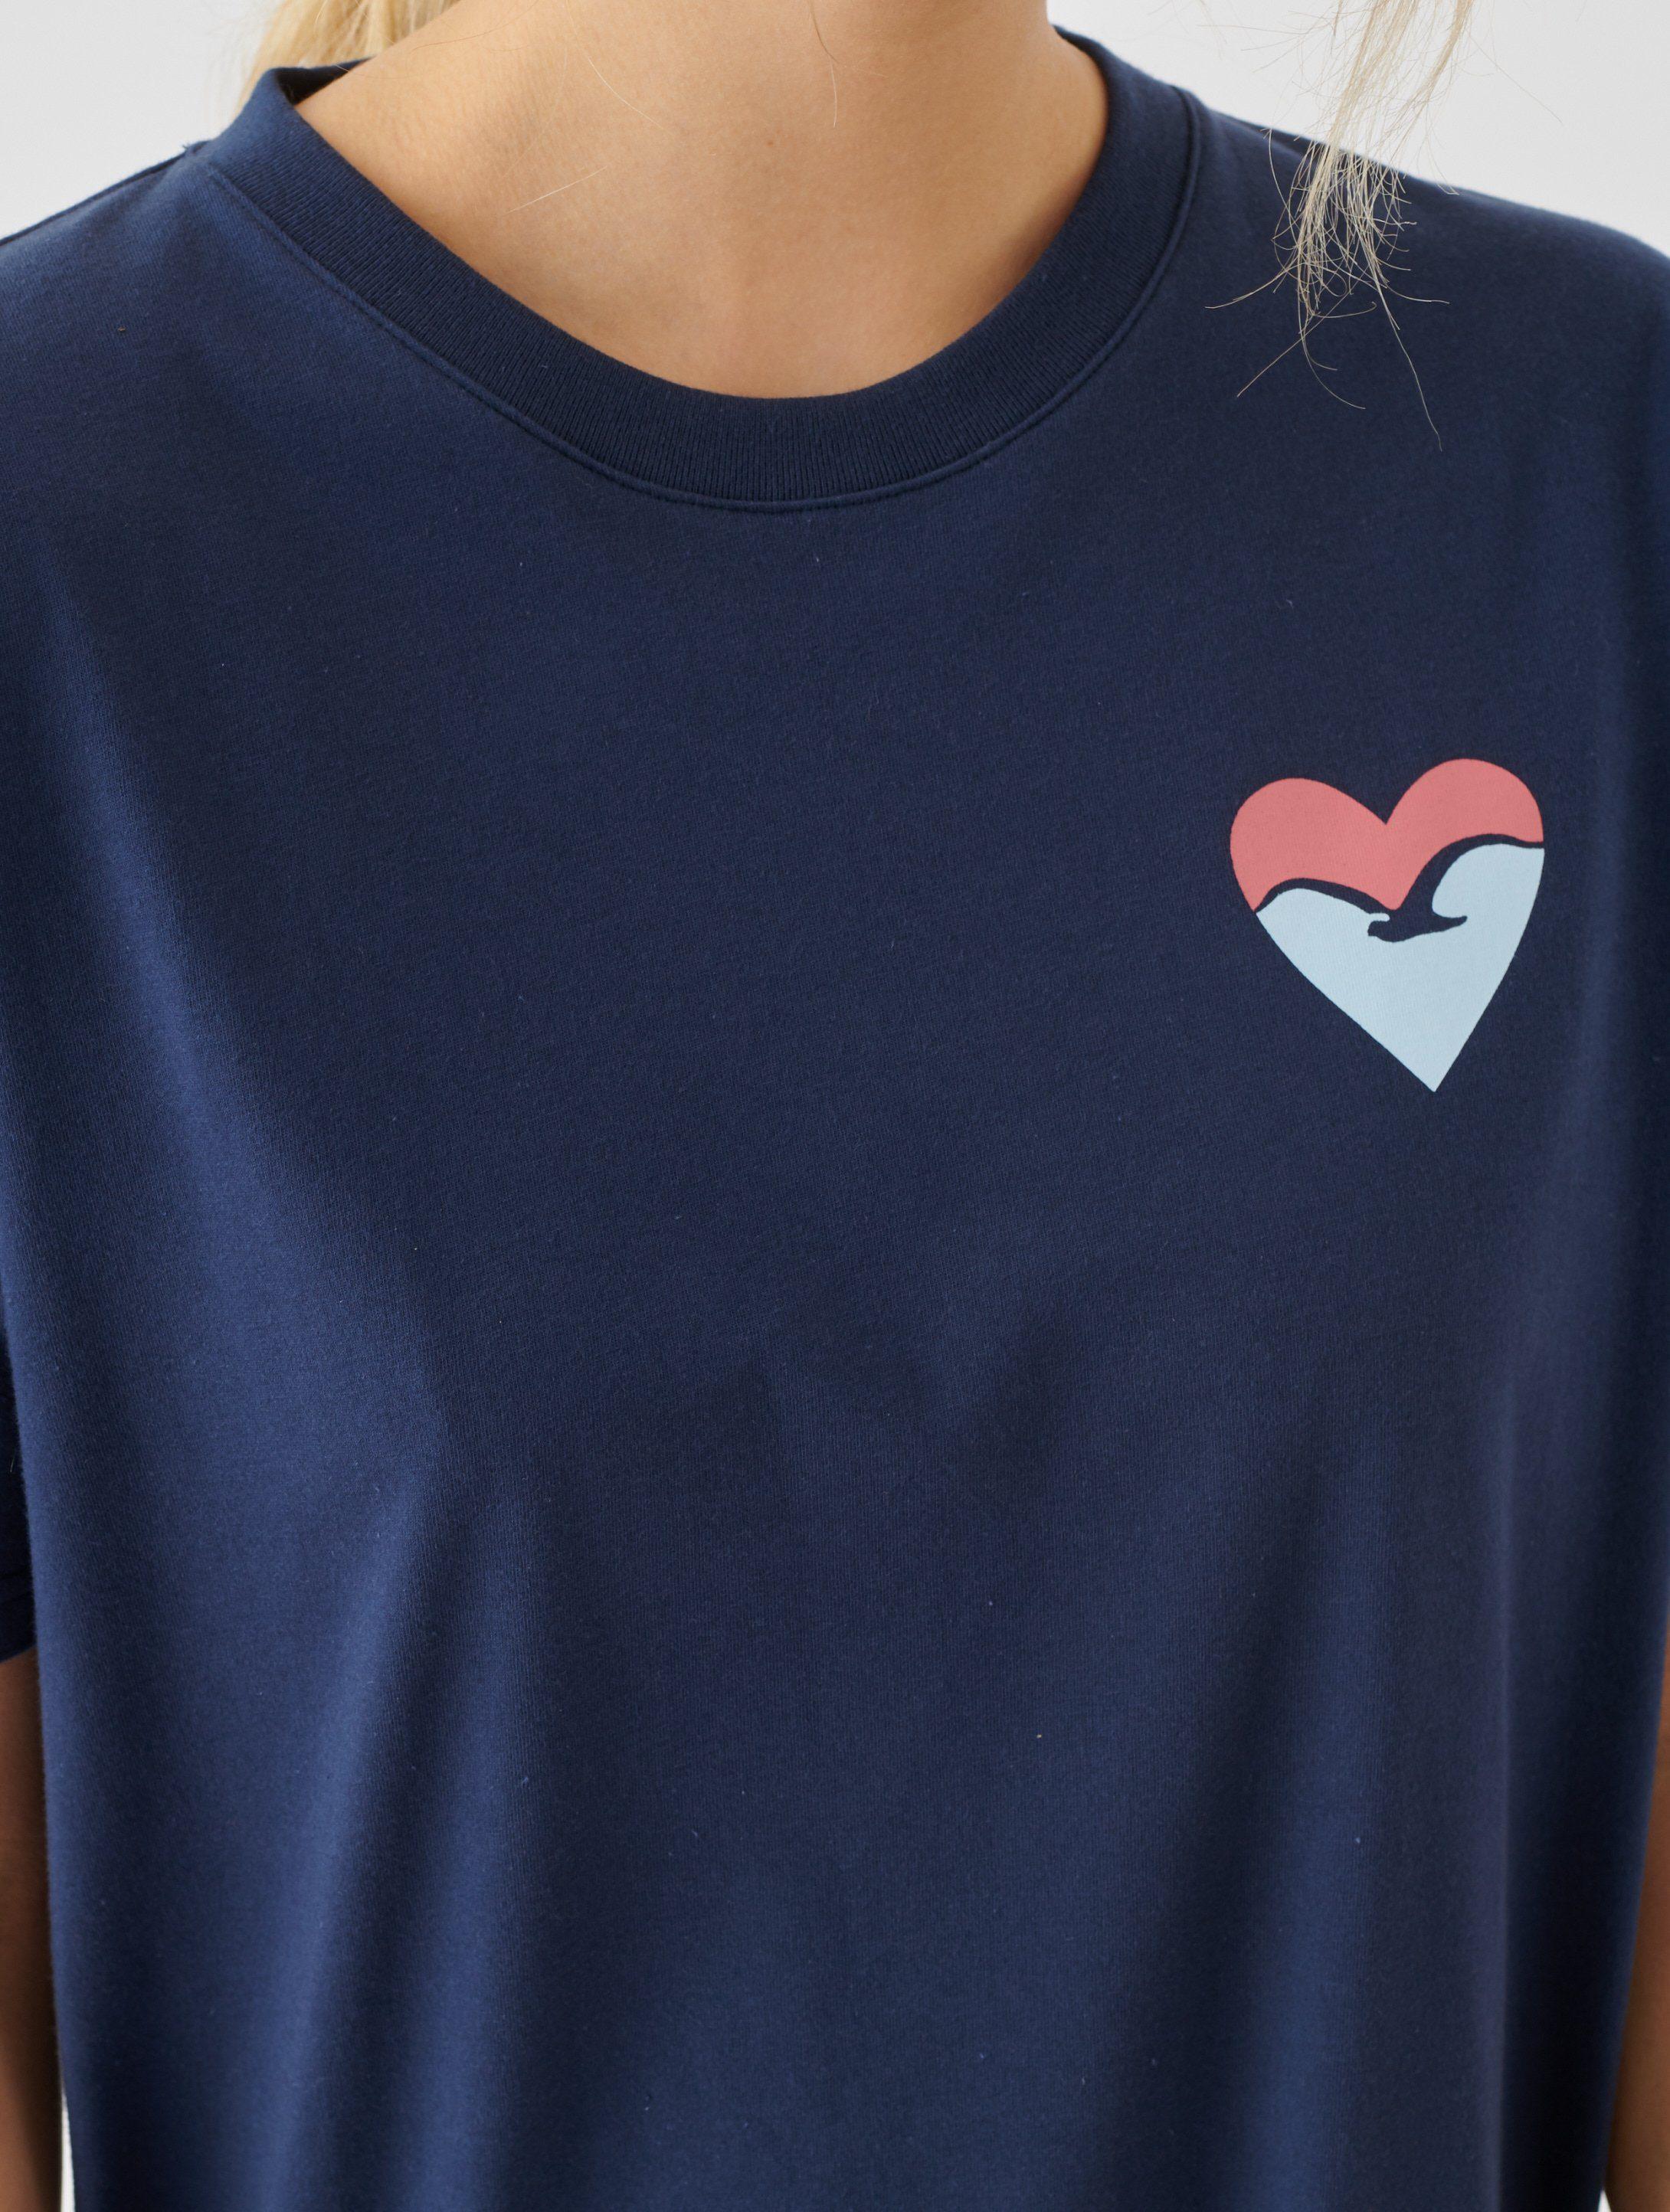 Cleptomanicx Jerseykleid Frida Heart Mit Logolabel Am Saum Online Kaufen